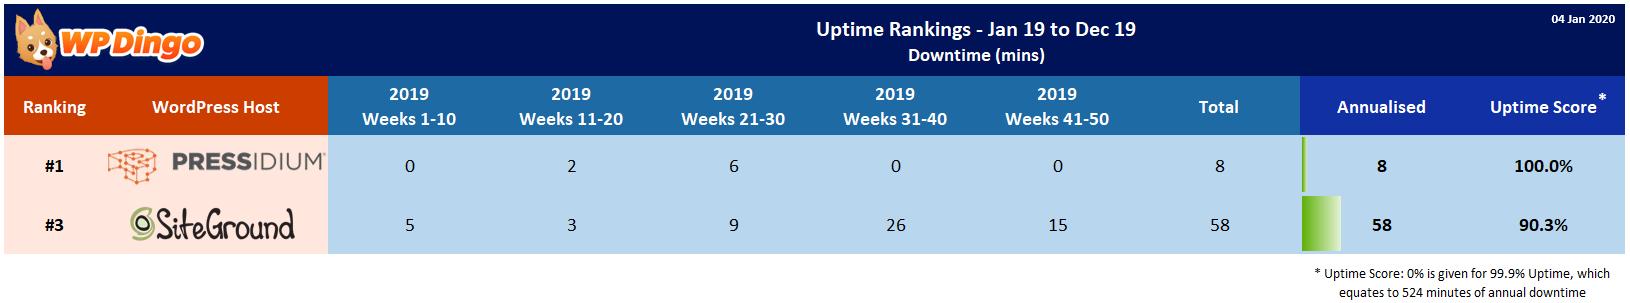 Pressidium vs SiteGround 2019 Uptime Test Results